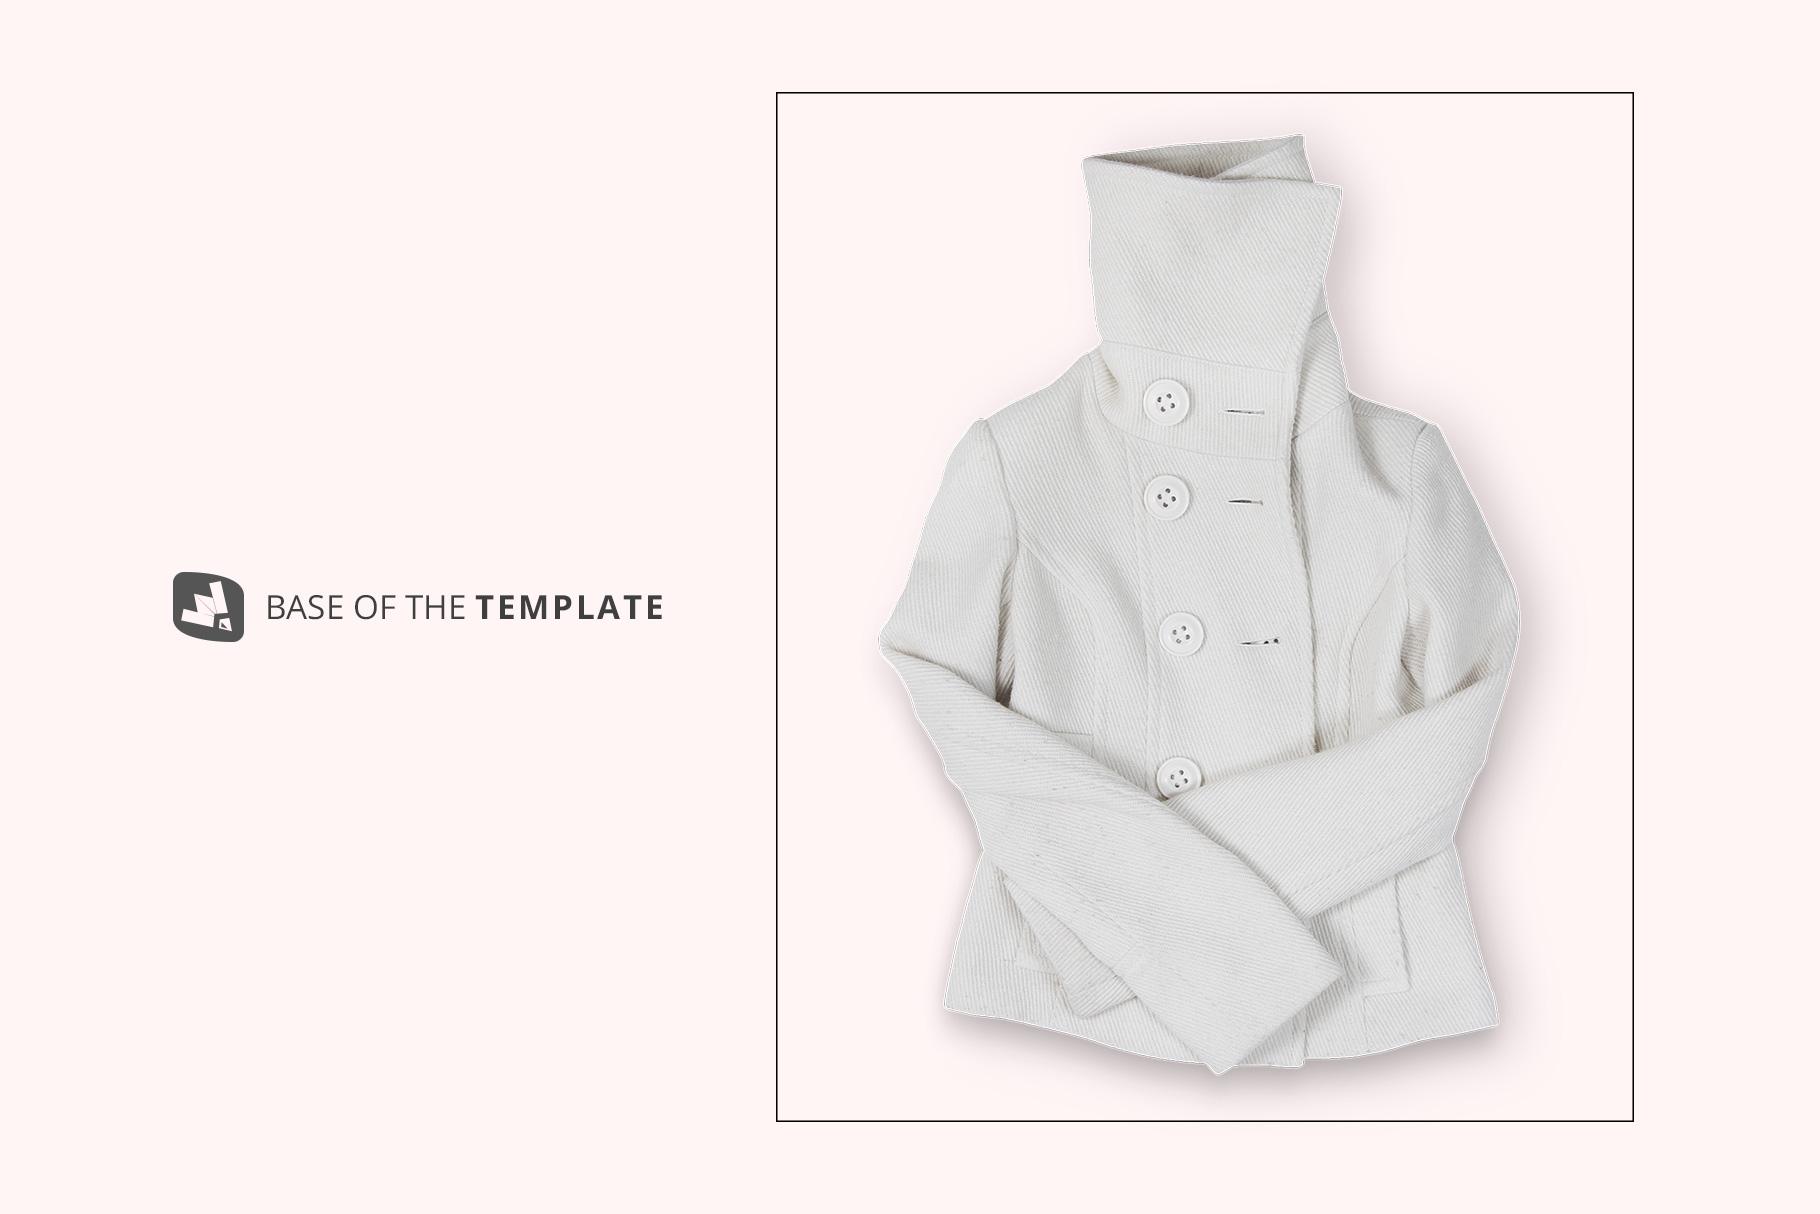 base image of the women's high collar jacket mockup